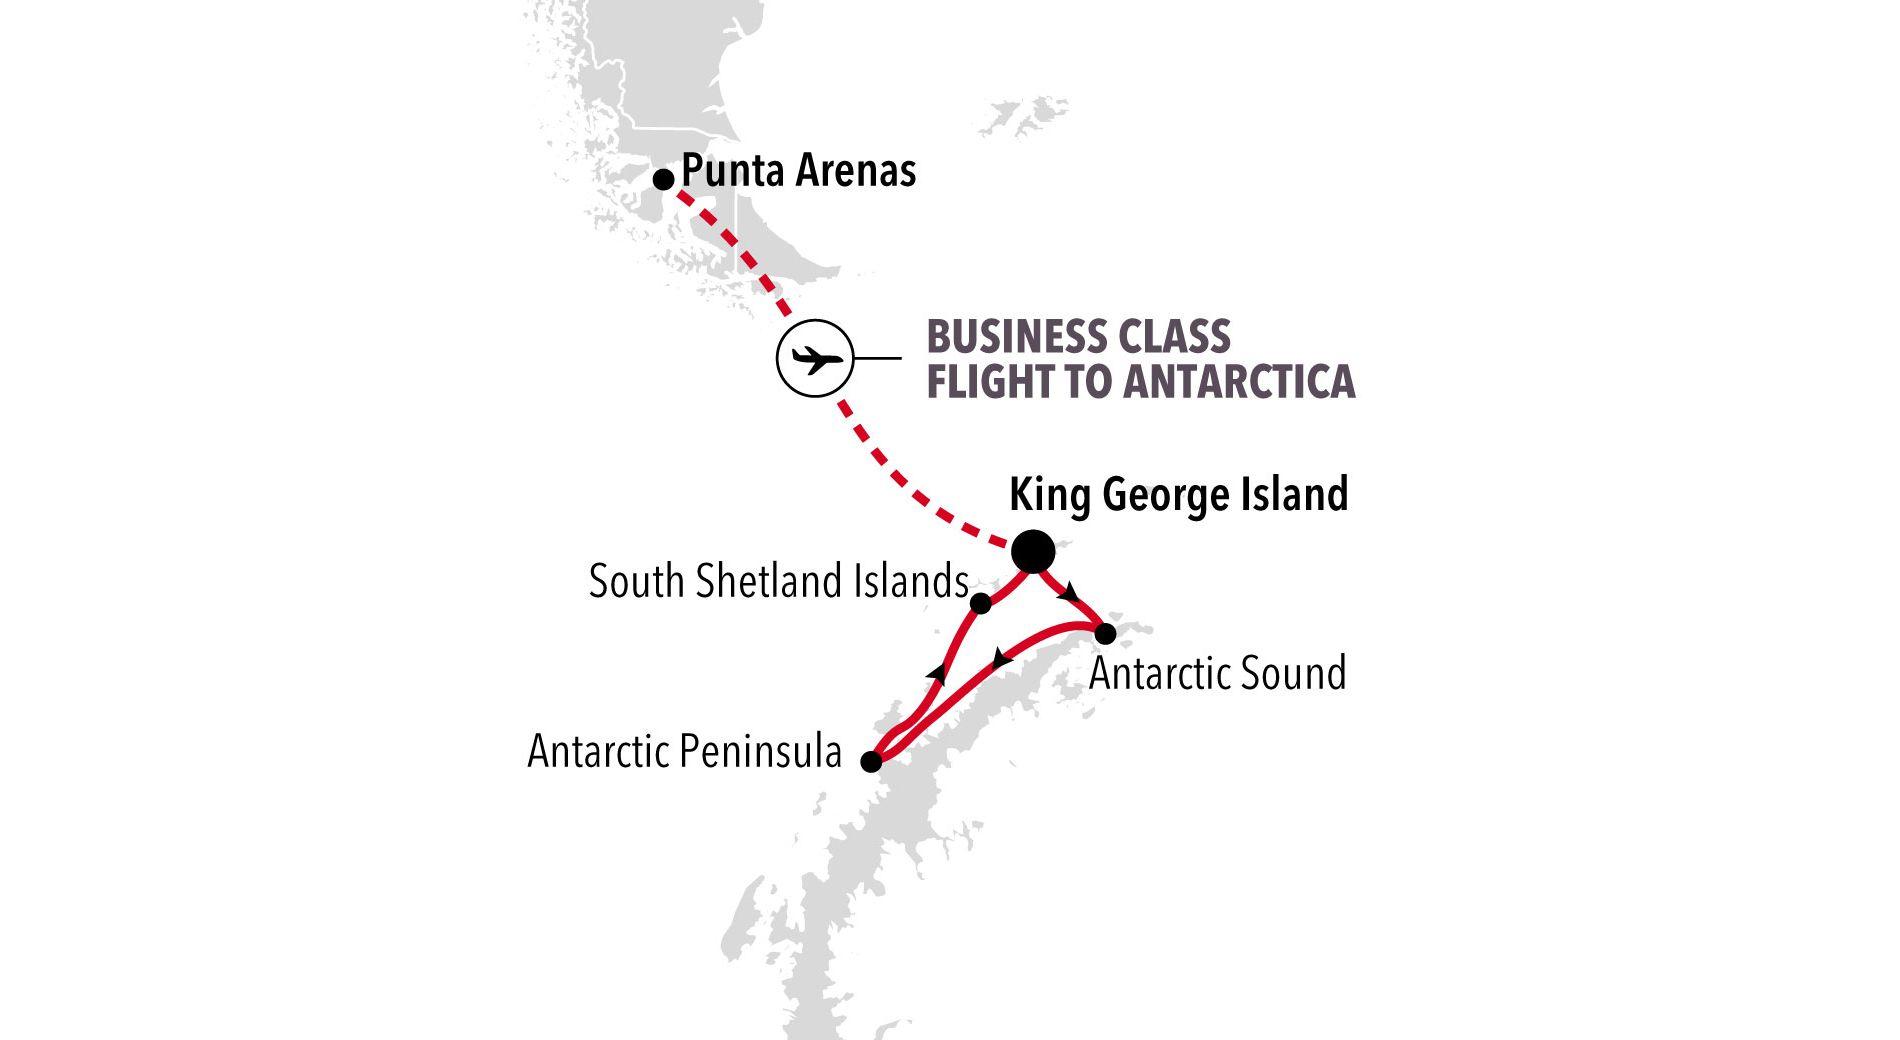 E1220205006 - King George Island to King George Island